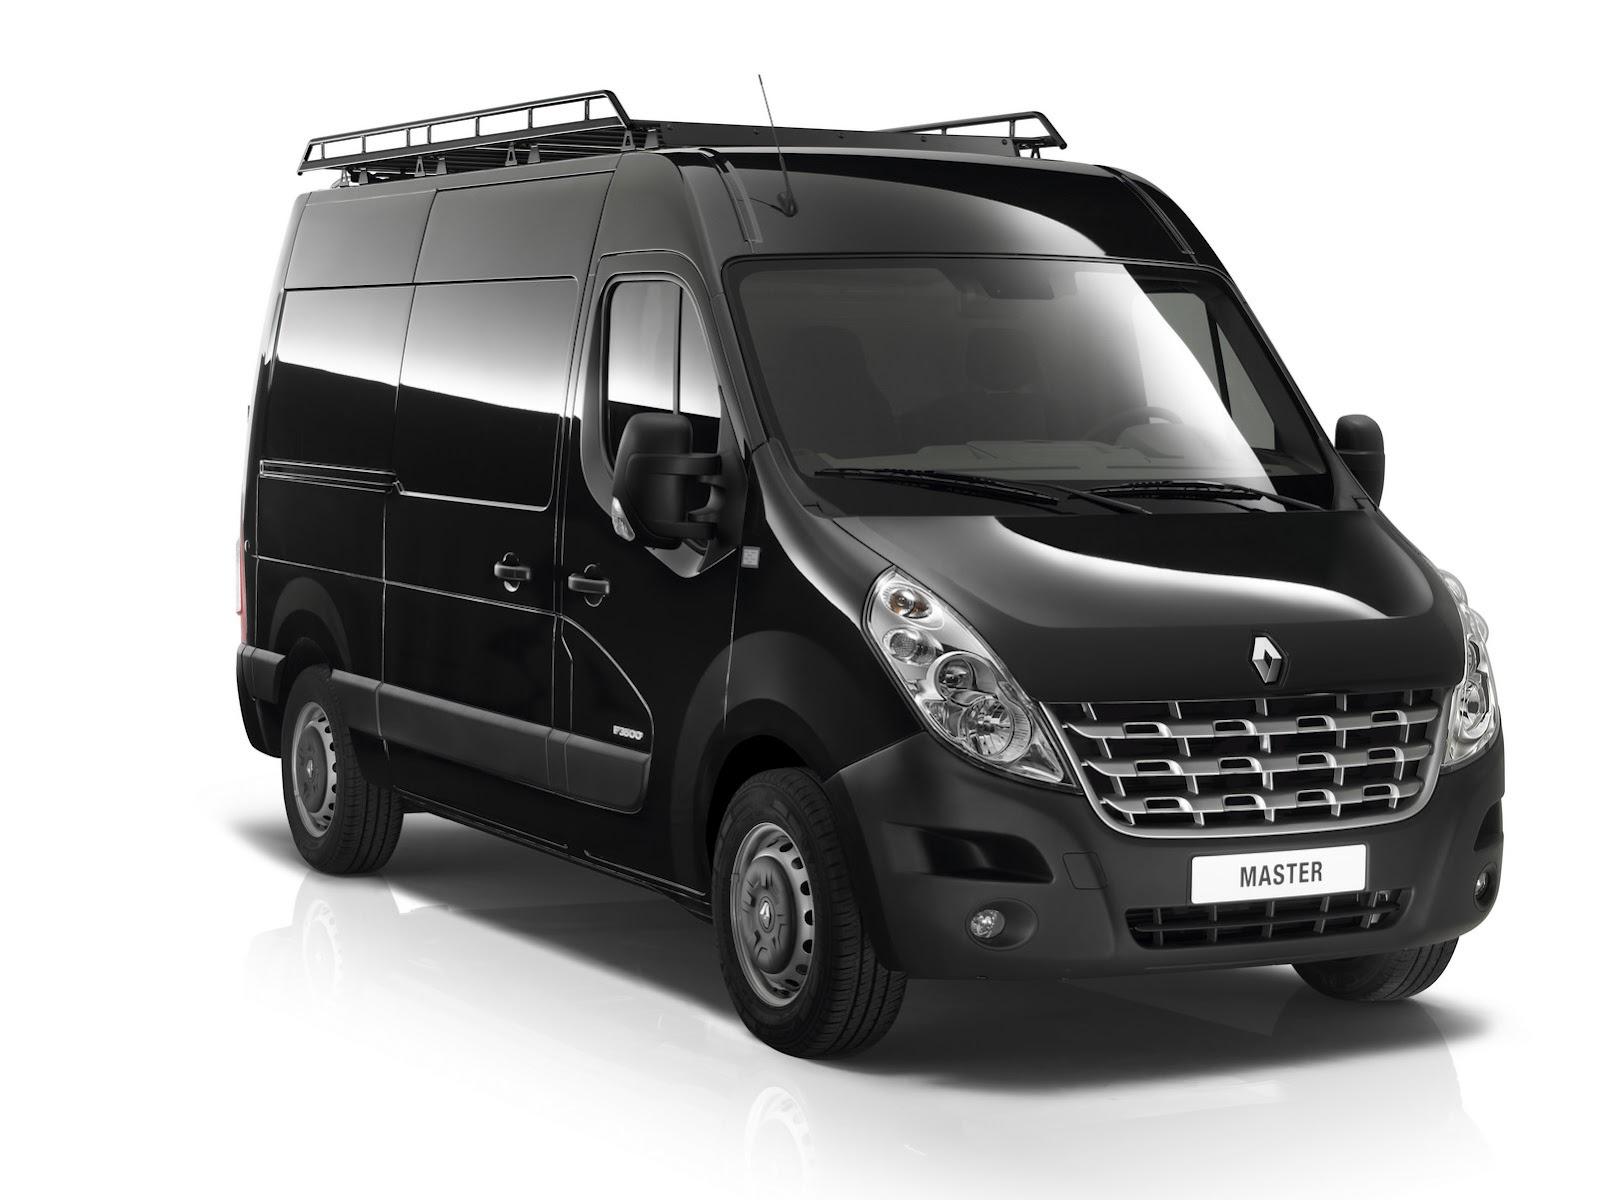 2012-Renault-Master-Van-3.jpg?imgmax=1800